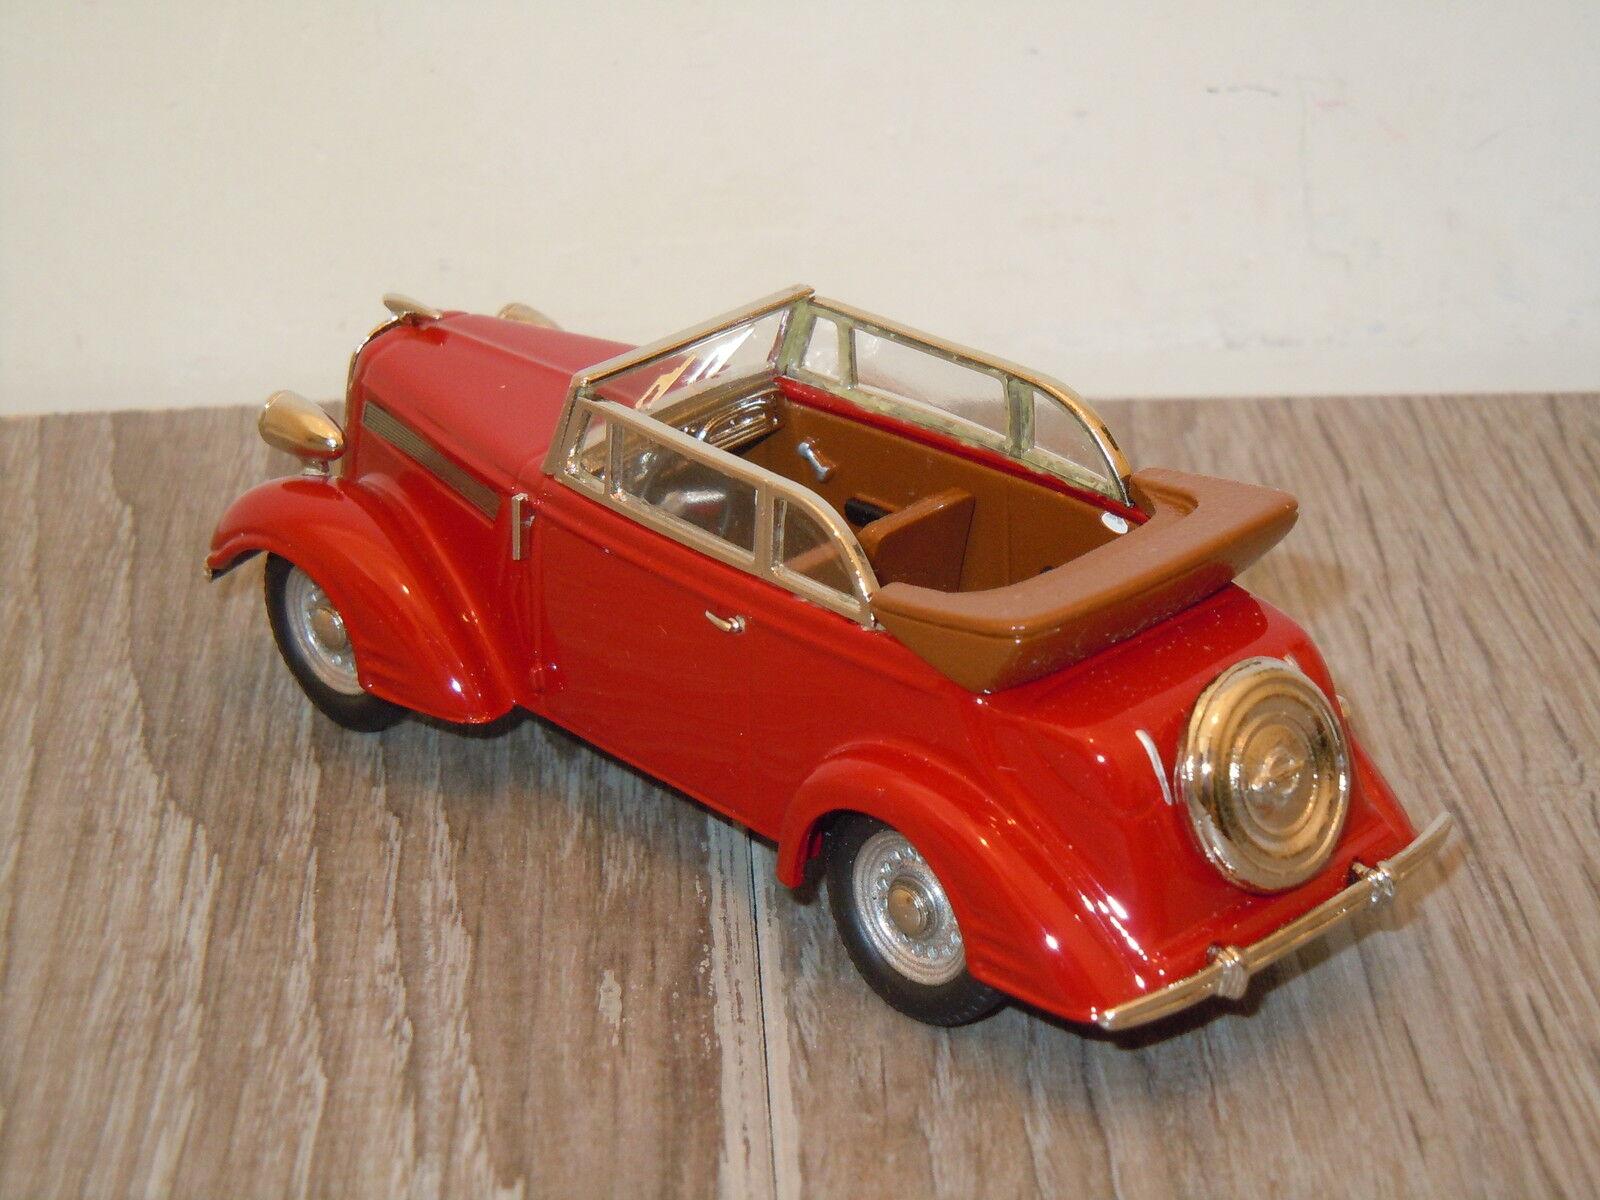 Opel Super 6 6 6 Cabriolet van Tin Wizard 3101 1 43 in scatola 10701 ac3117